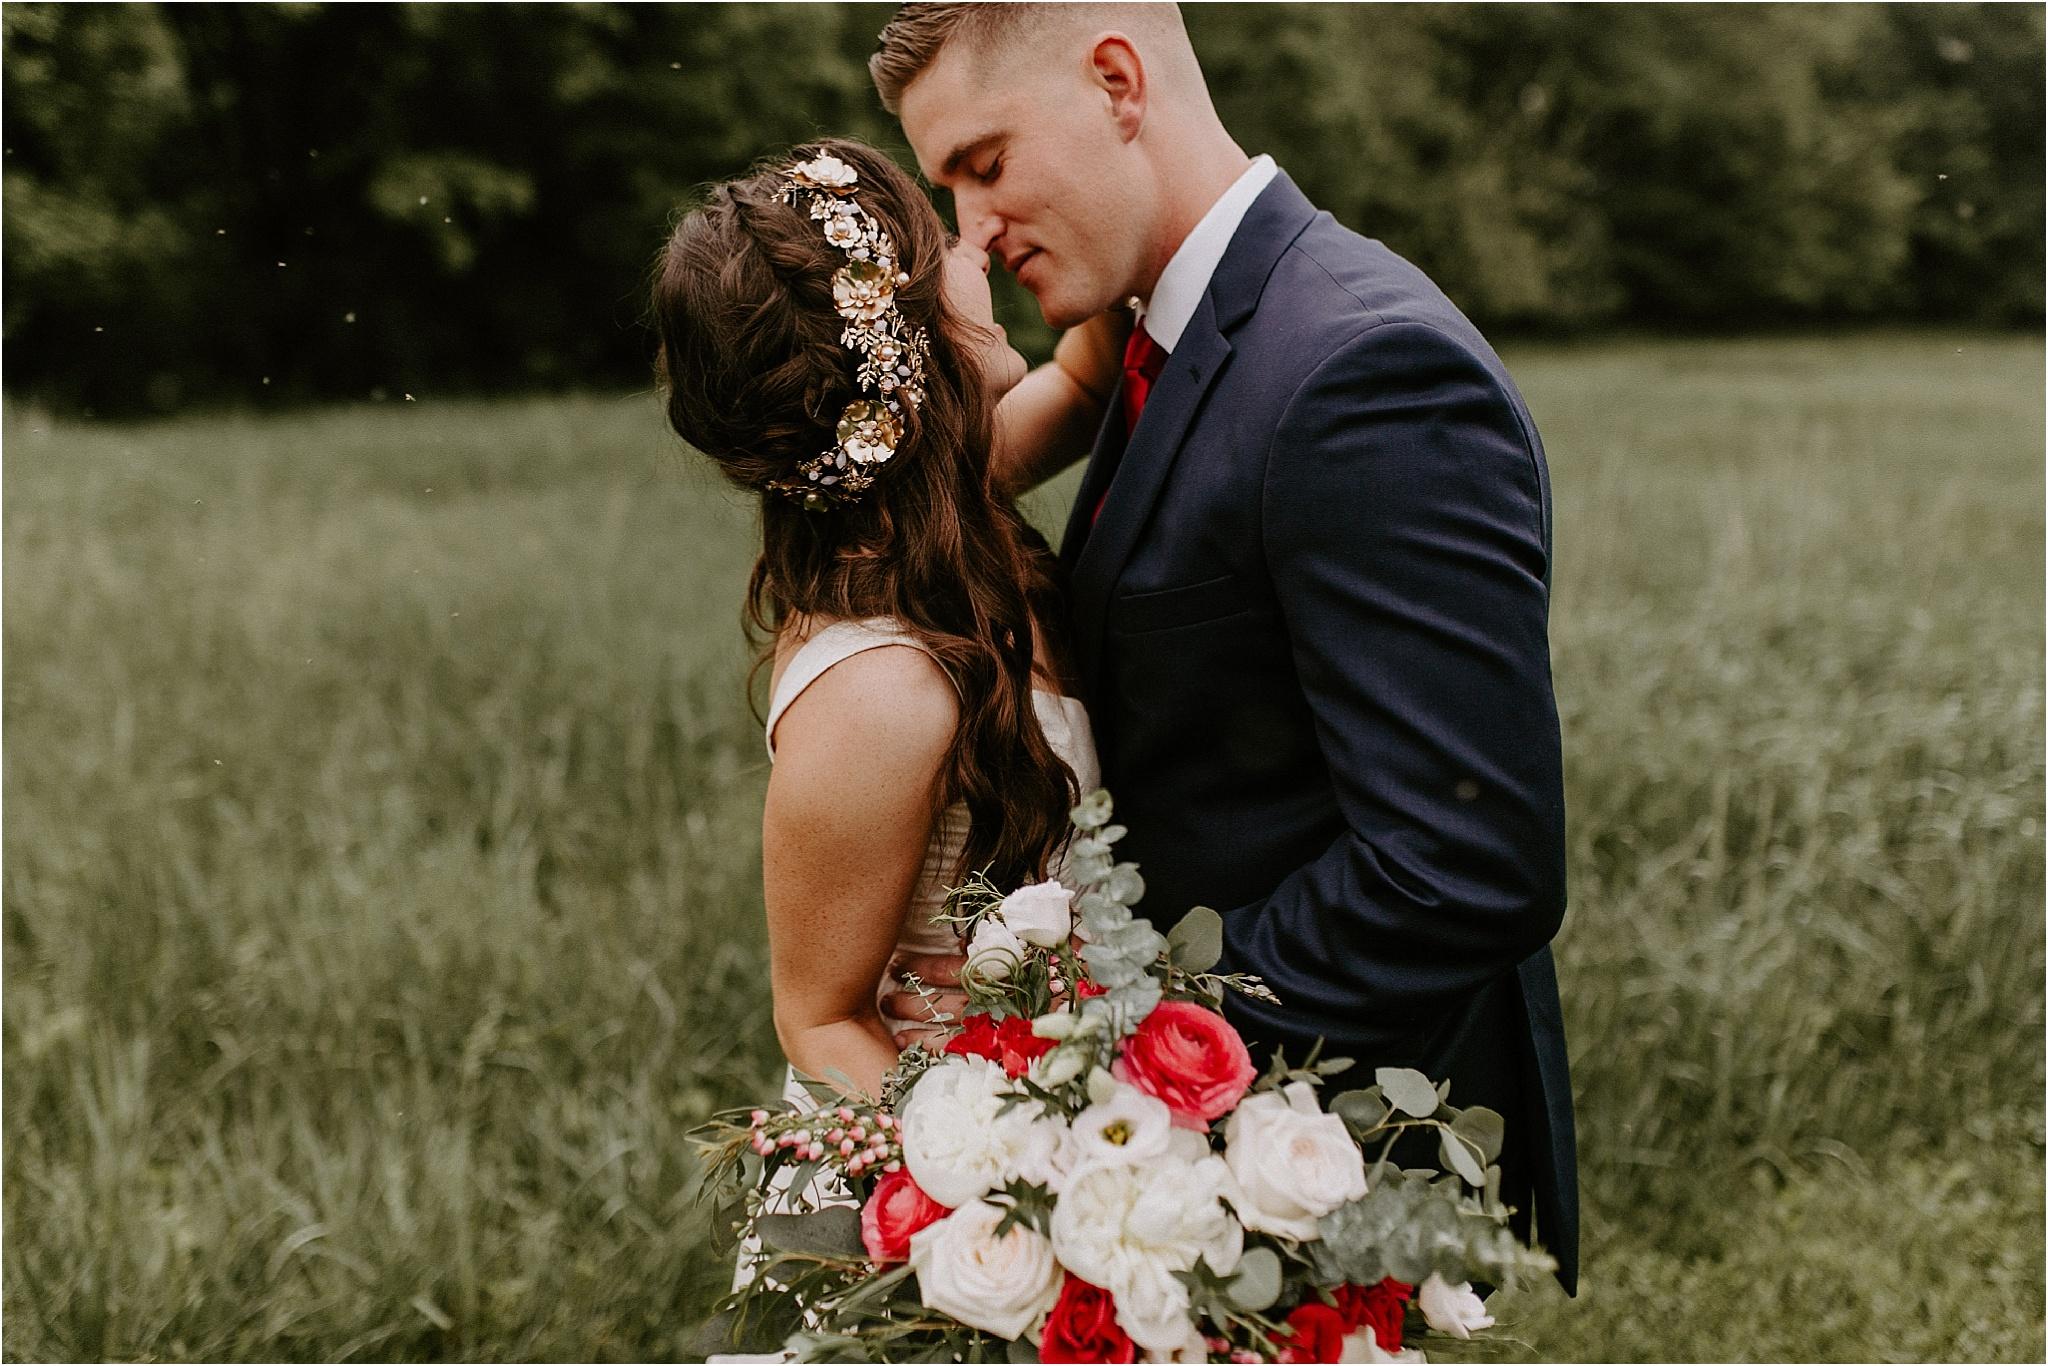 Sarah_Brookhart_Farm_at_Eagles_Ridge_Wedding_Photographer_0060.jpg